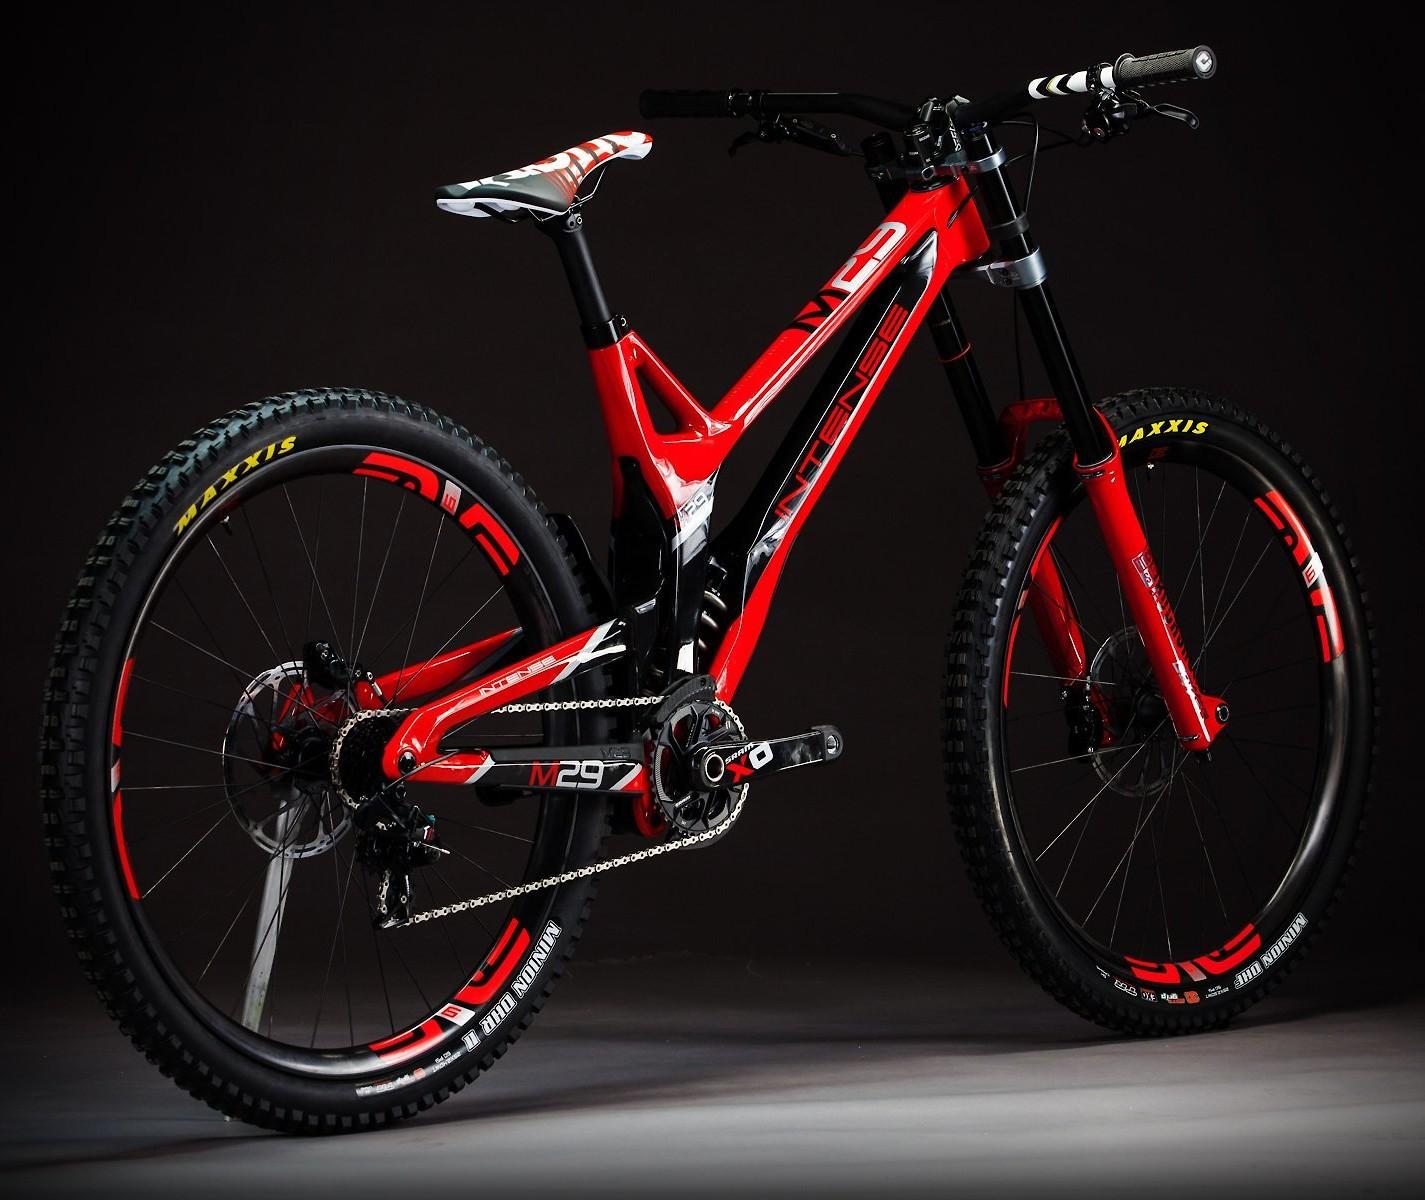 2019 Intense M29 Fro Bike Reviews Comparisons Specs Mountain Bikes Vital Mtb Shop for mountain bikes at mec. 2019 intense m29 fro bike reviews